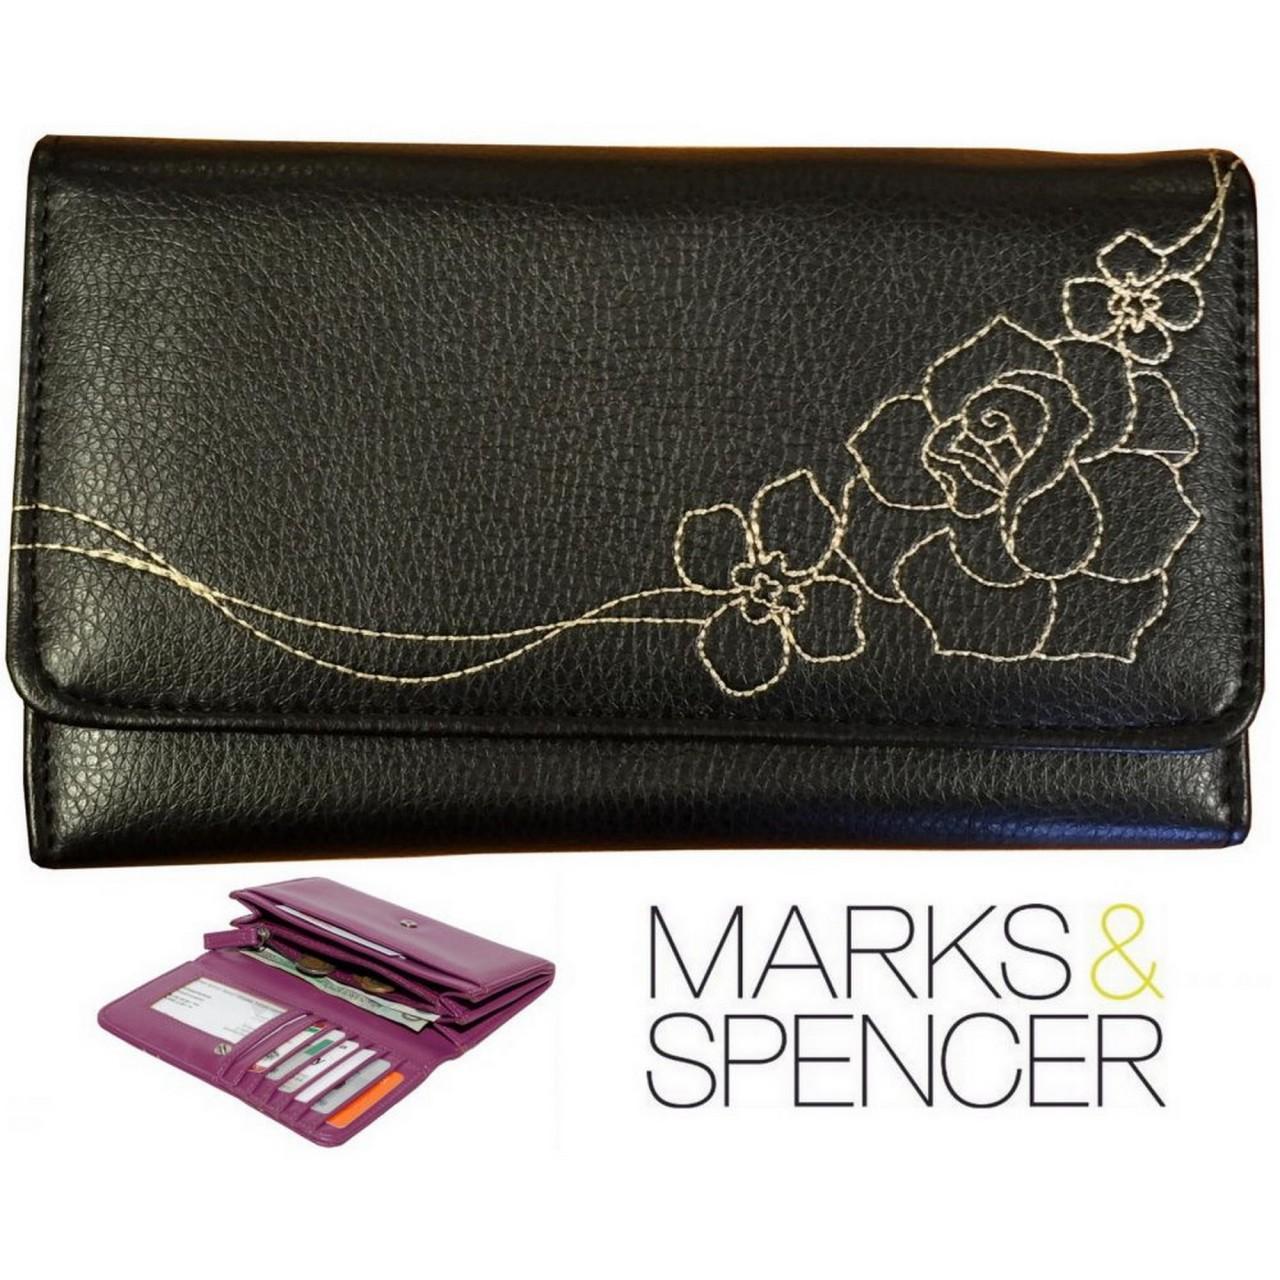 Geldbörse Damen Marks&Spencer